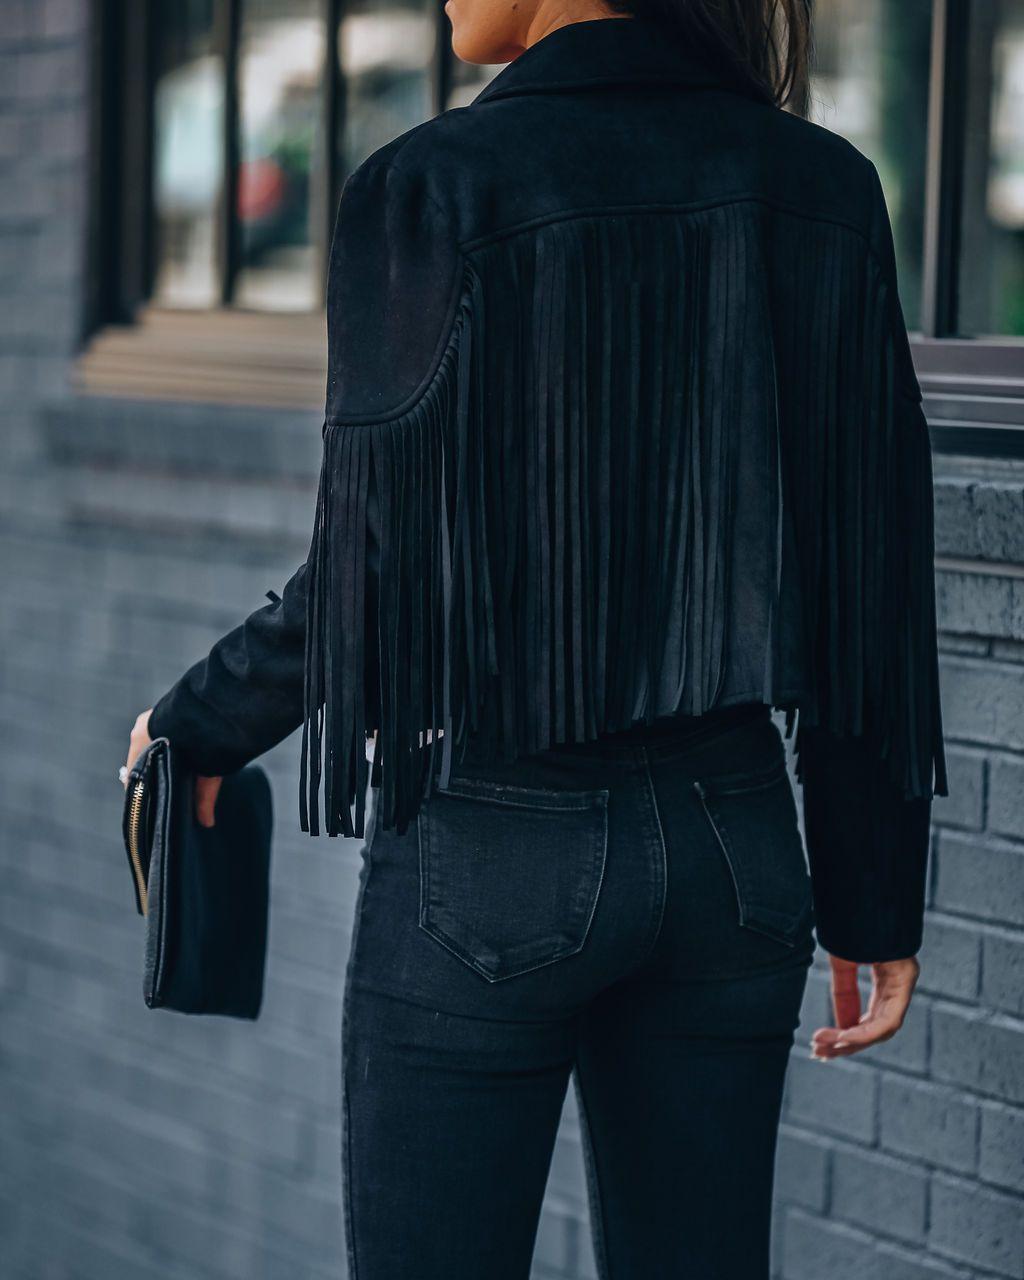 Hc80f0b1339c24b6dbb92bb68142aad92V Fringed Bomber Jacket Women Spring Fashion Long Sleeve Turn-down Collar Open Stitch Slim Jackets